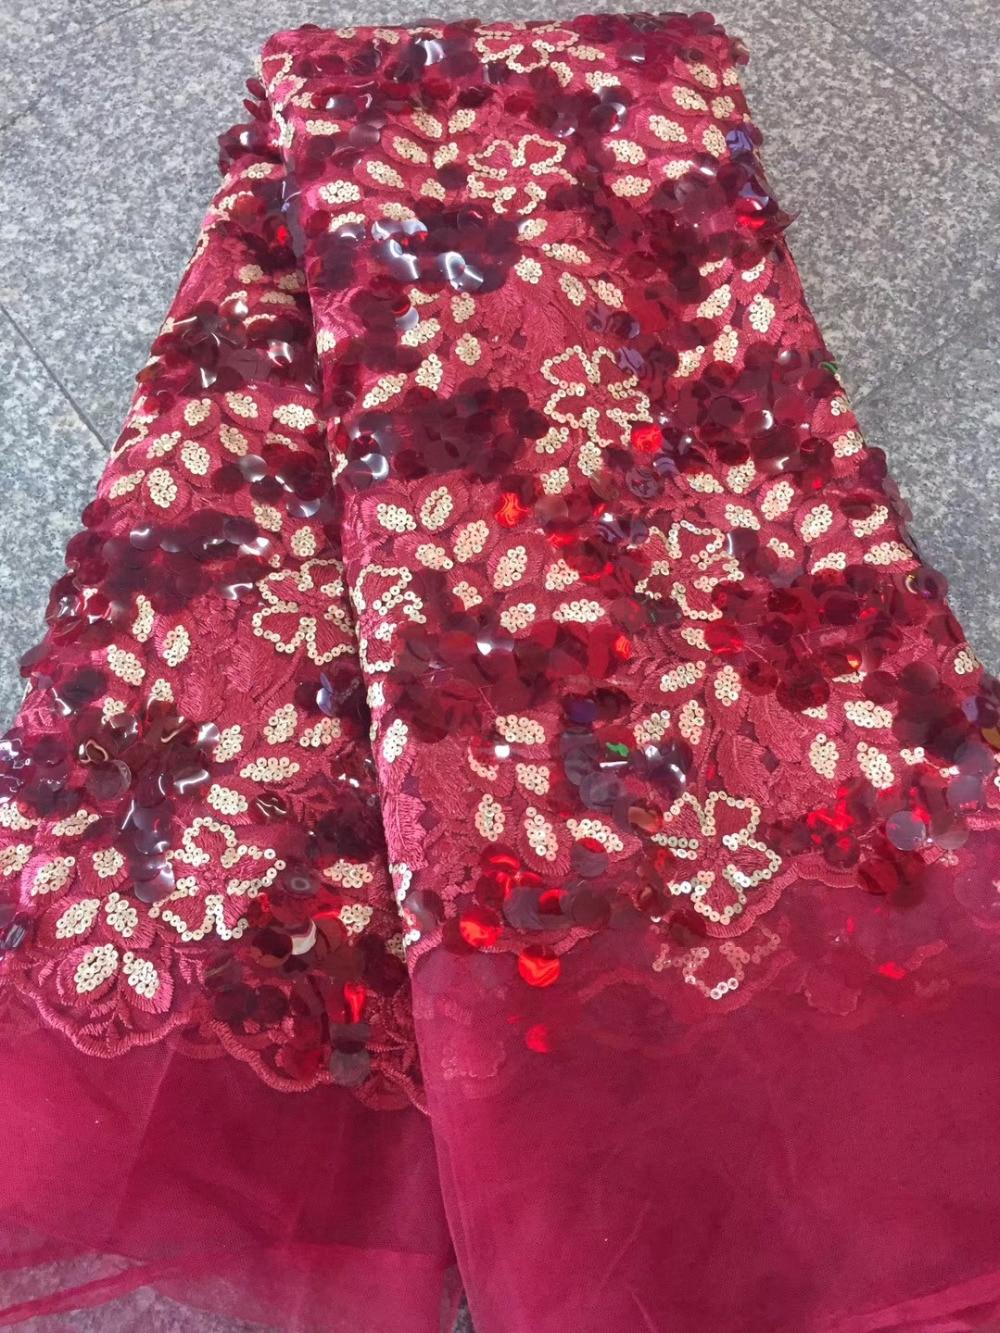 Top Gold Glitter Mesh Fabric For Evening Dress Big Sequin Fabric For ... 42e3f2ec96ef